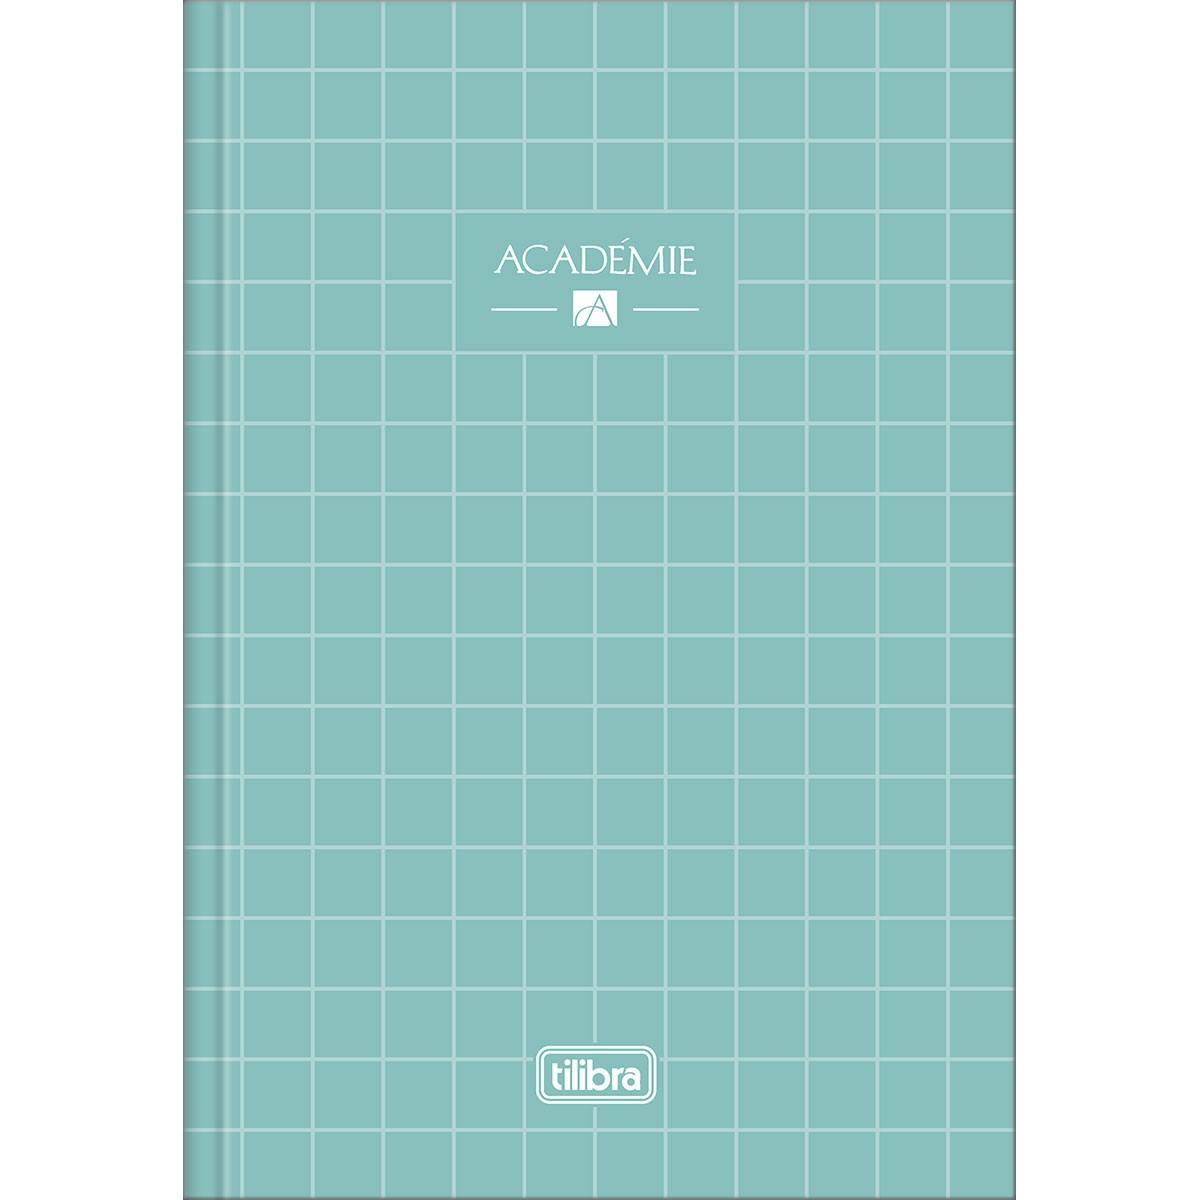 Caderno Brochura Capa Dura 1/4 Académie 80 Fls - Tilibra